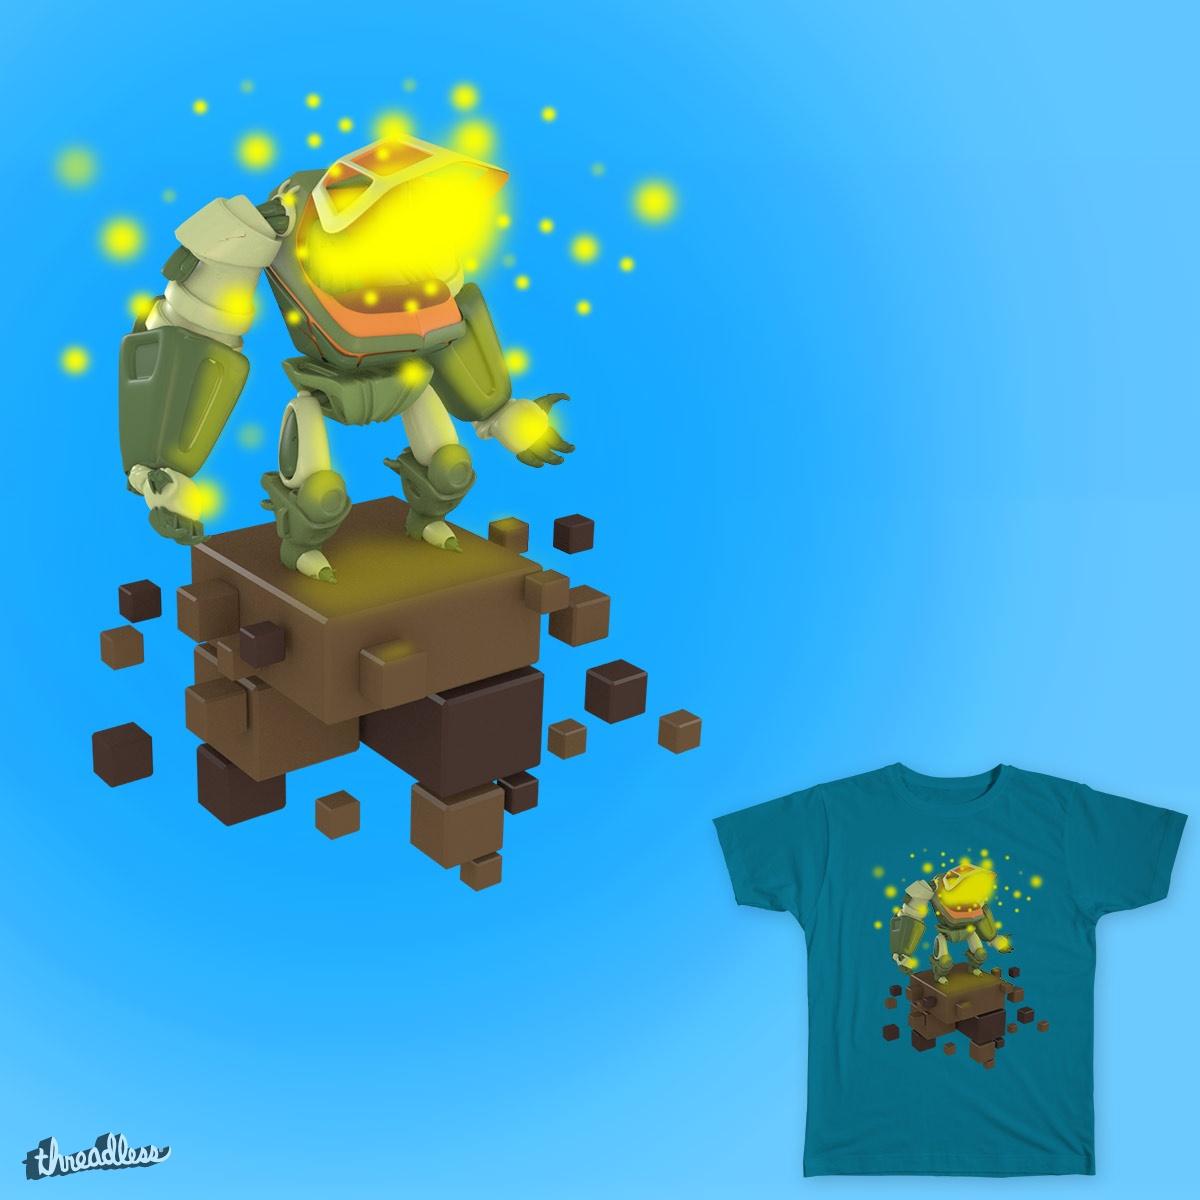 Ascension, a cool t-shirt design